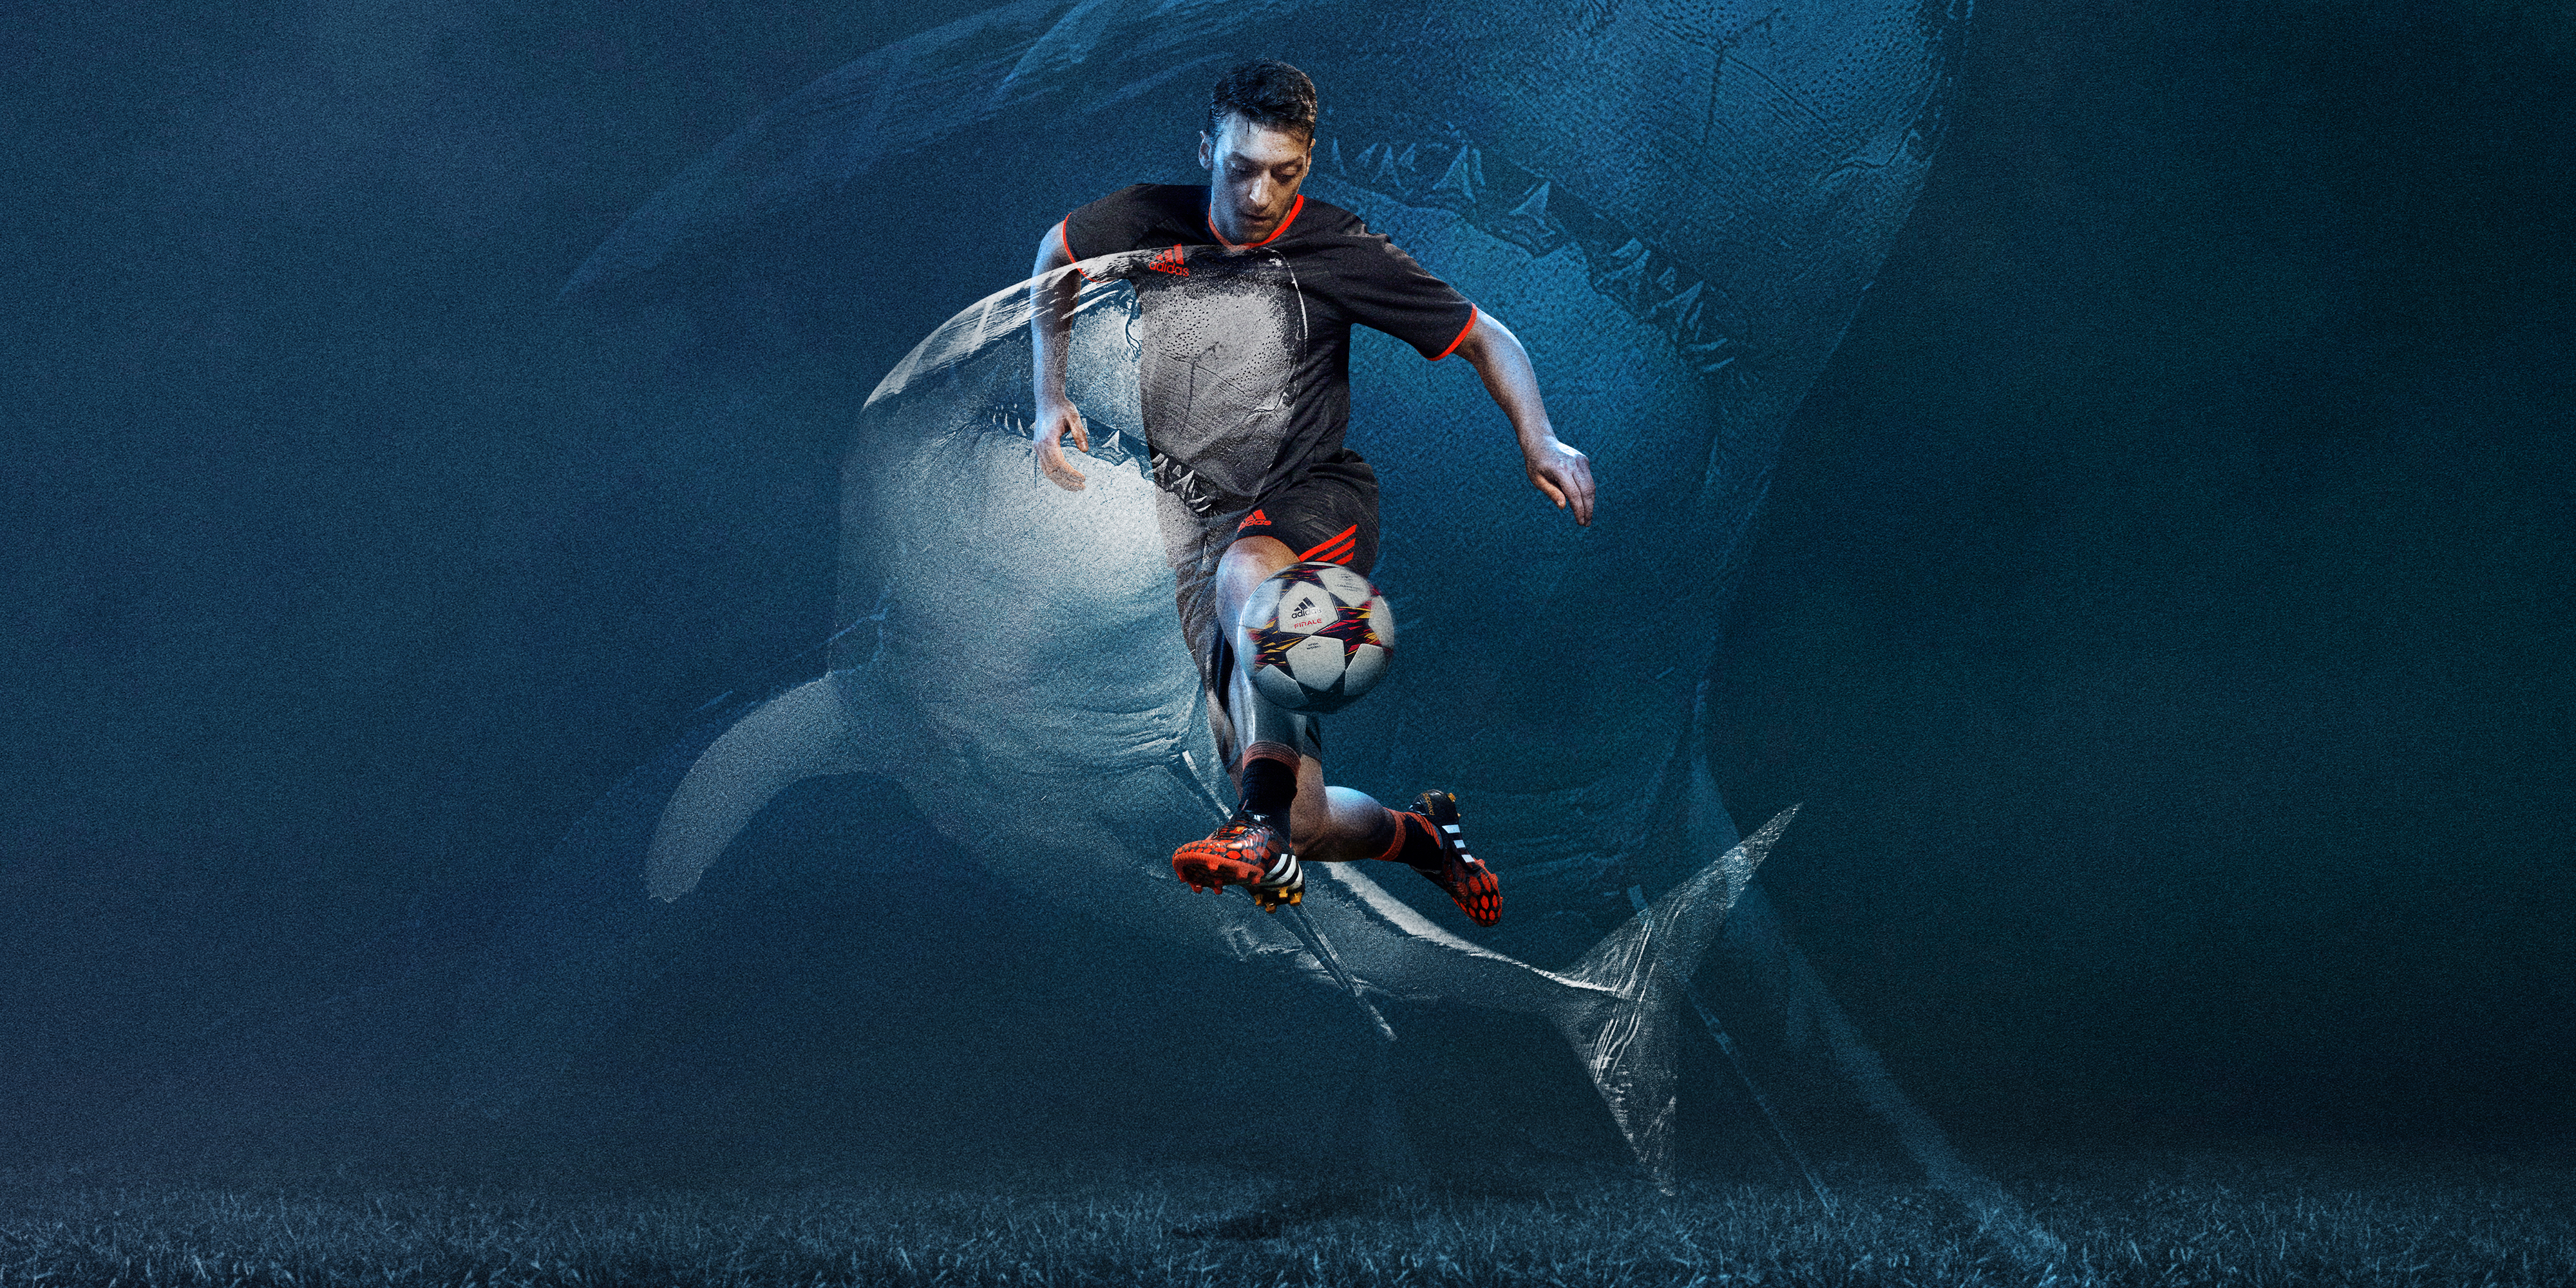 Pred_S2_Ozil_Shark_2x1